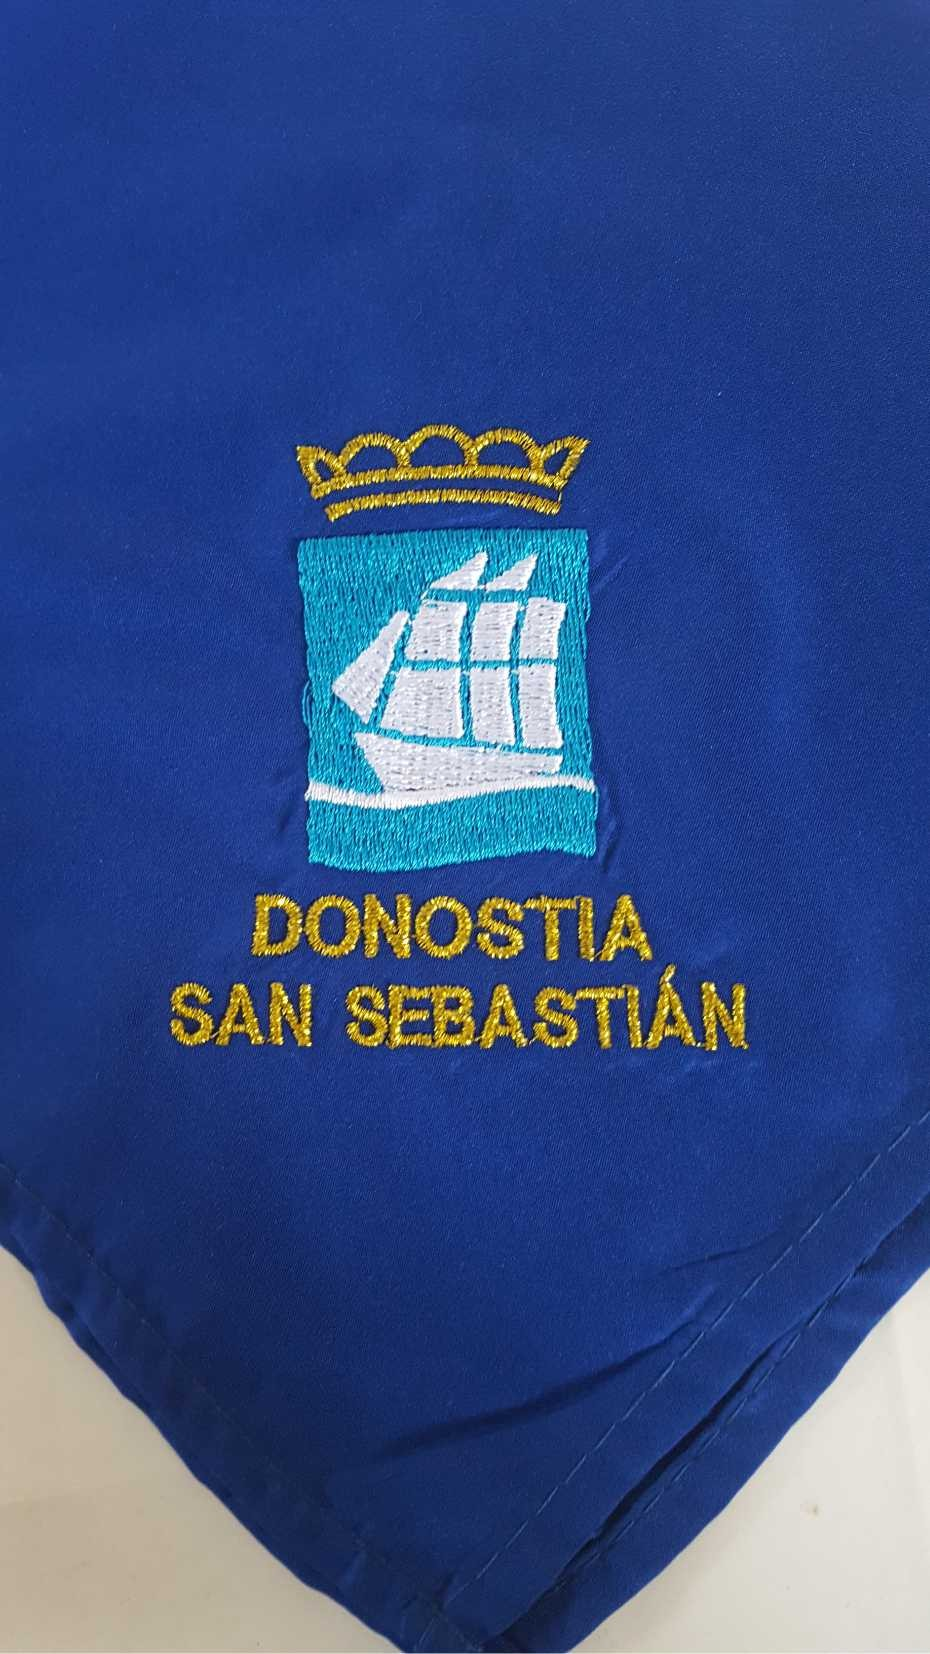 Donostia 1